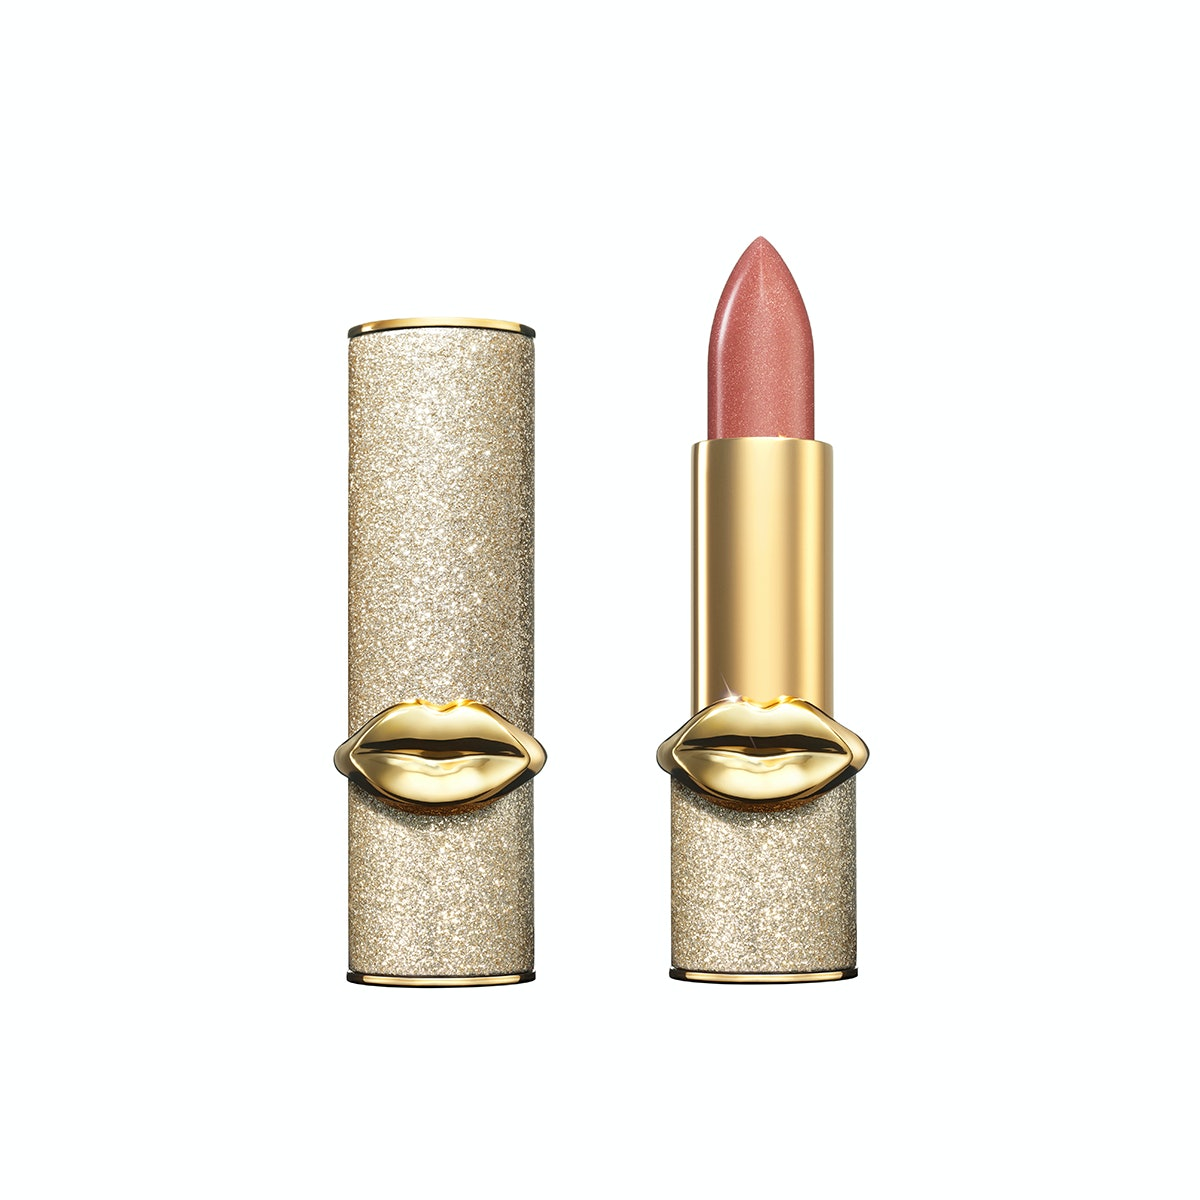 BLITZTRANCE™ Lipstick in Full Fantasy